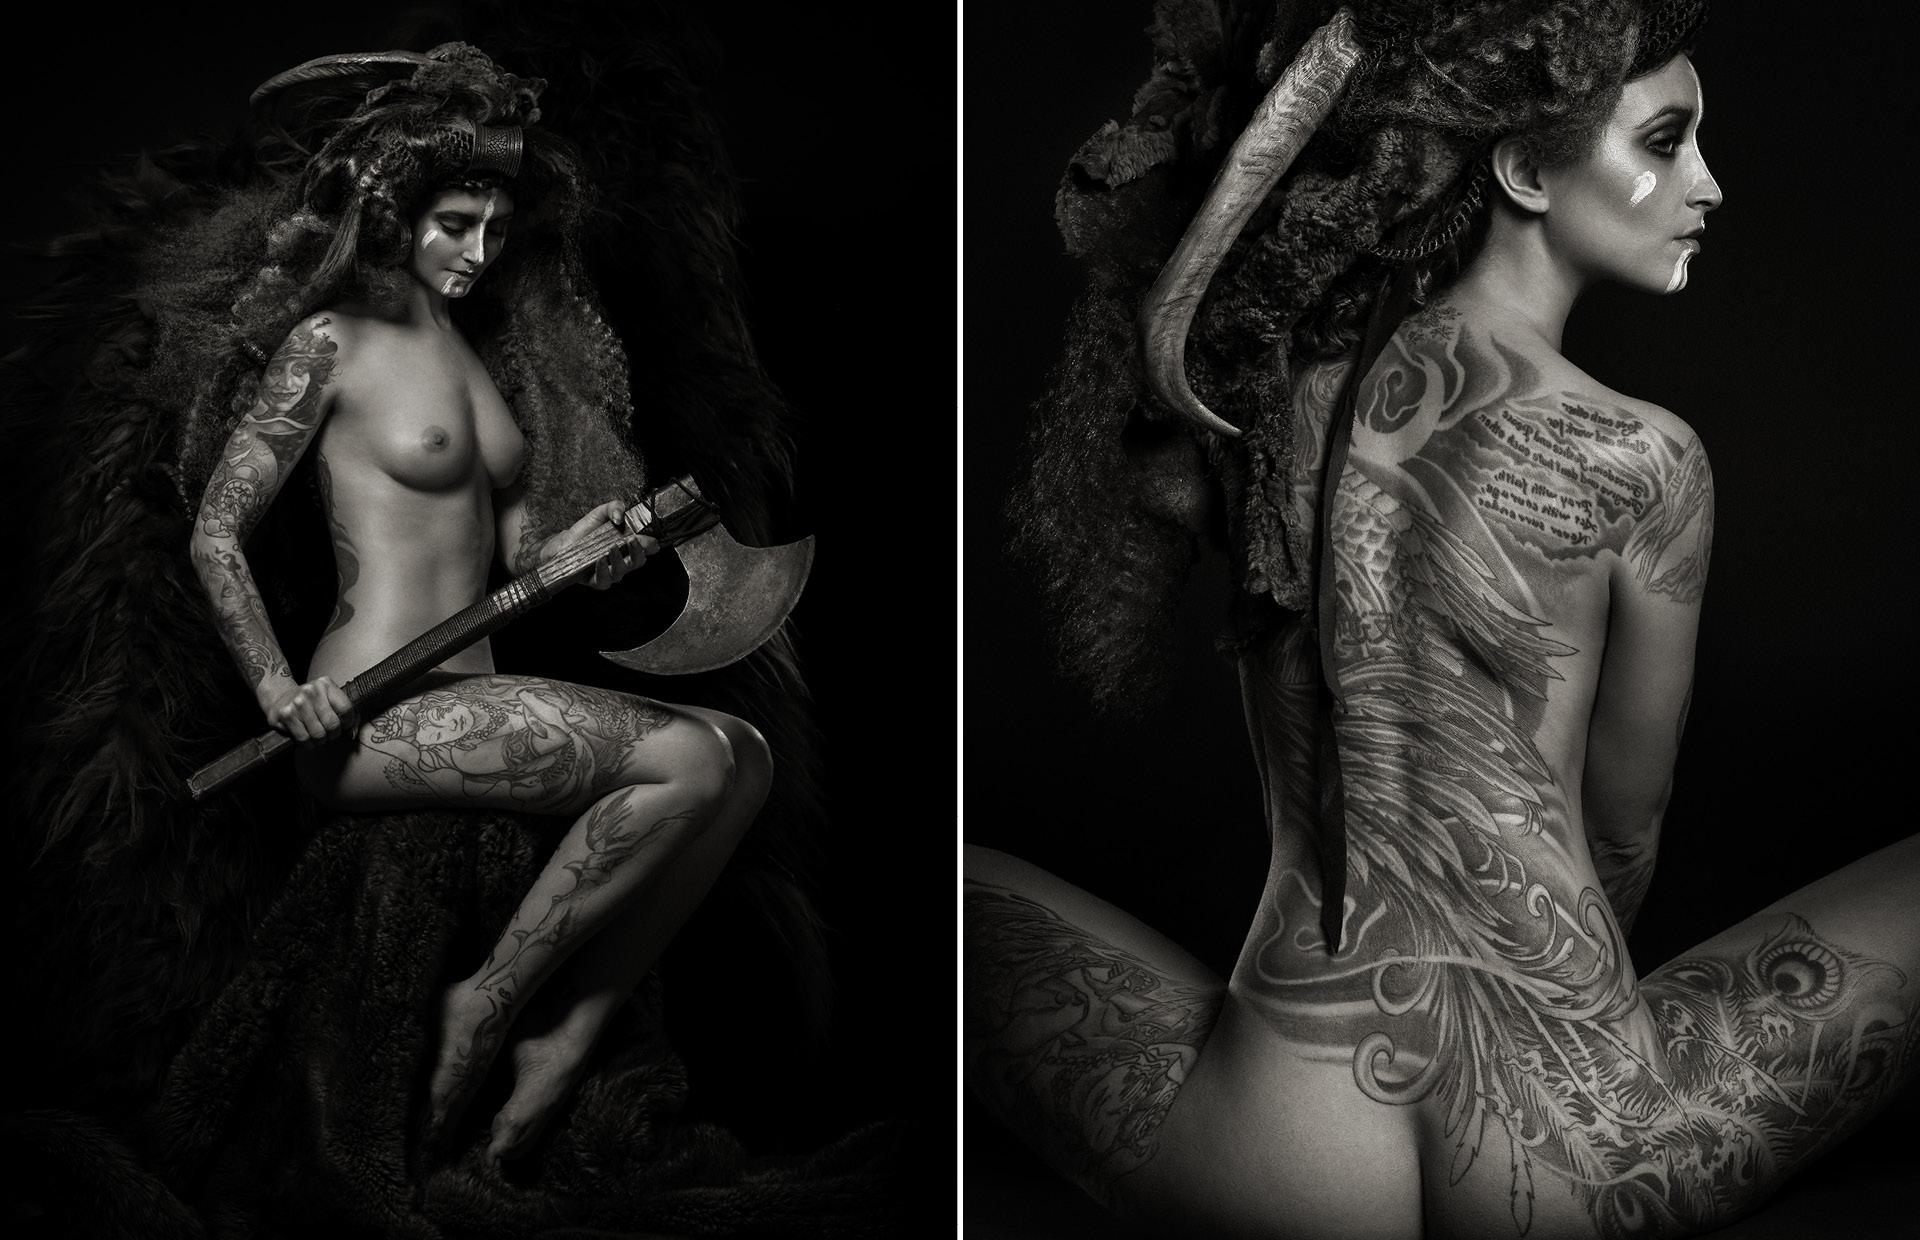 Spirit-&-Flesh-Magazine_Valkyrie-Ink_by-Reka-Nyari_6